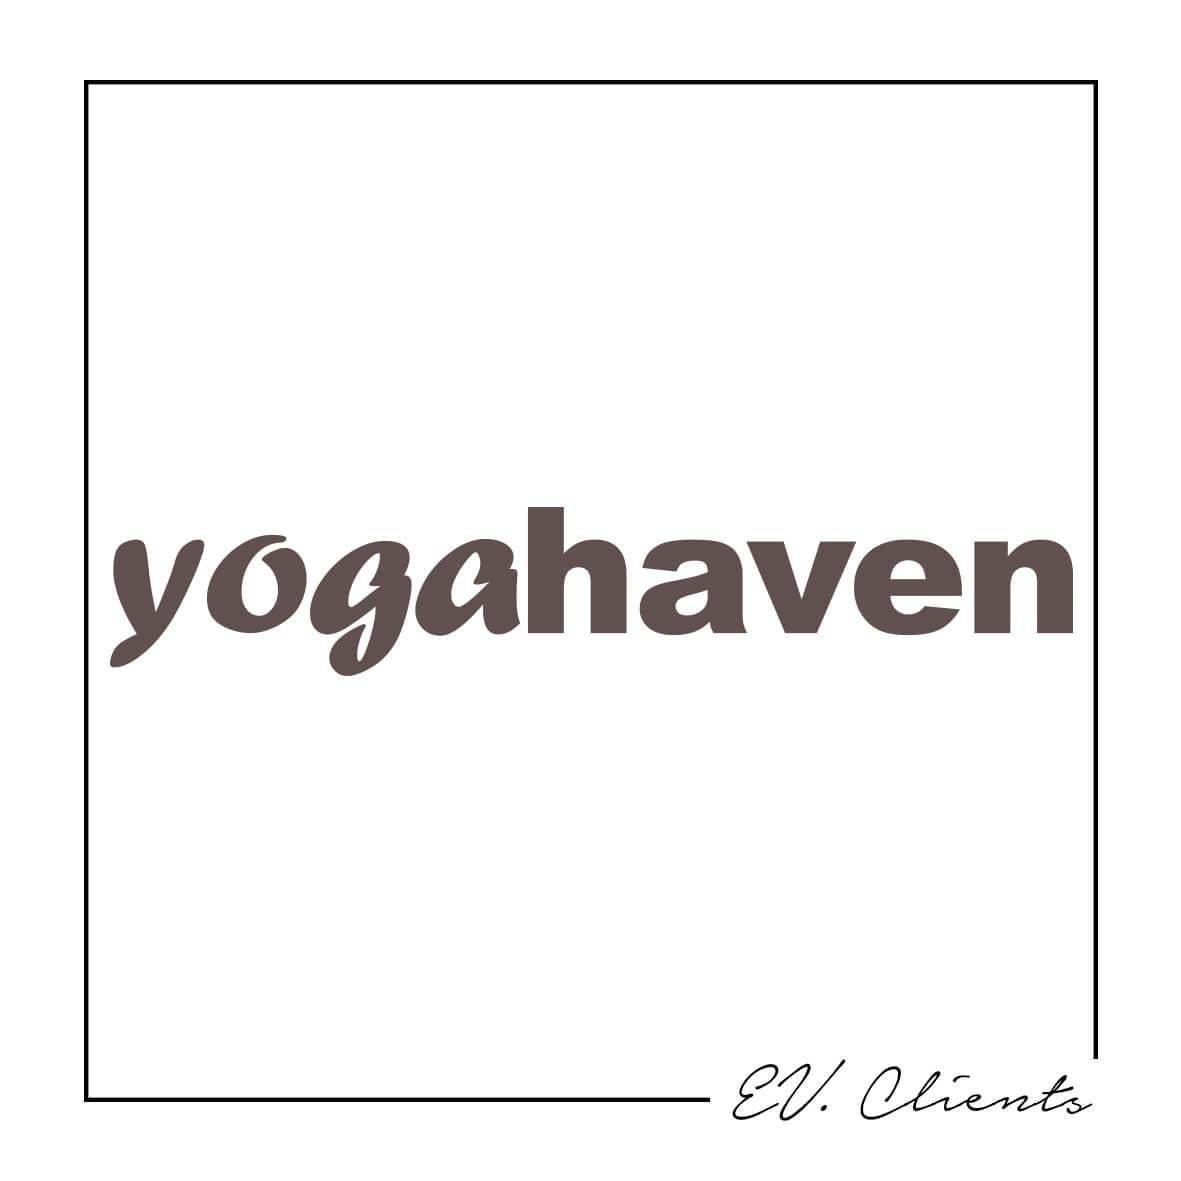 Yogahaven, Yogahaven Birmingham